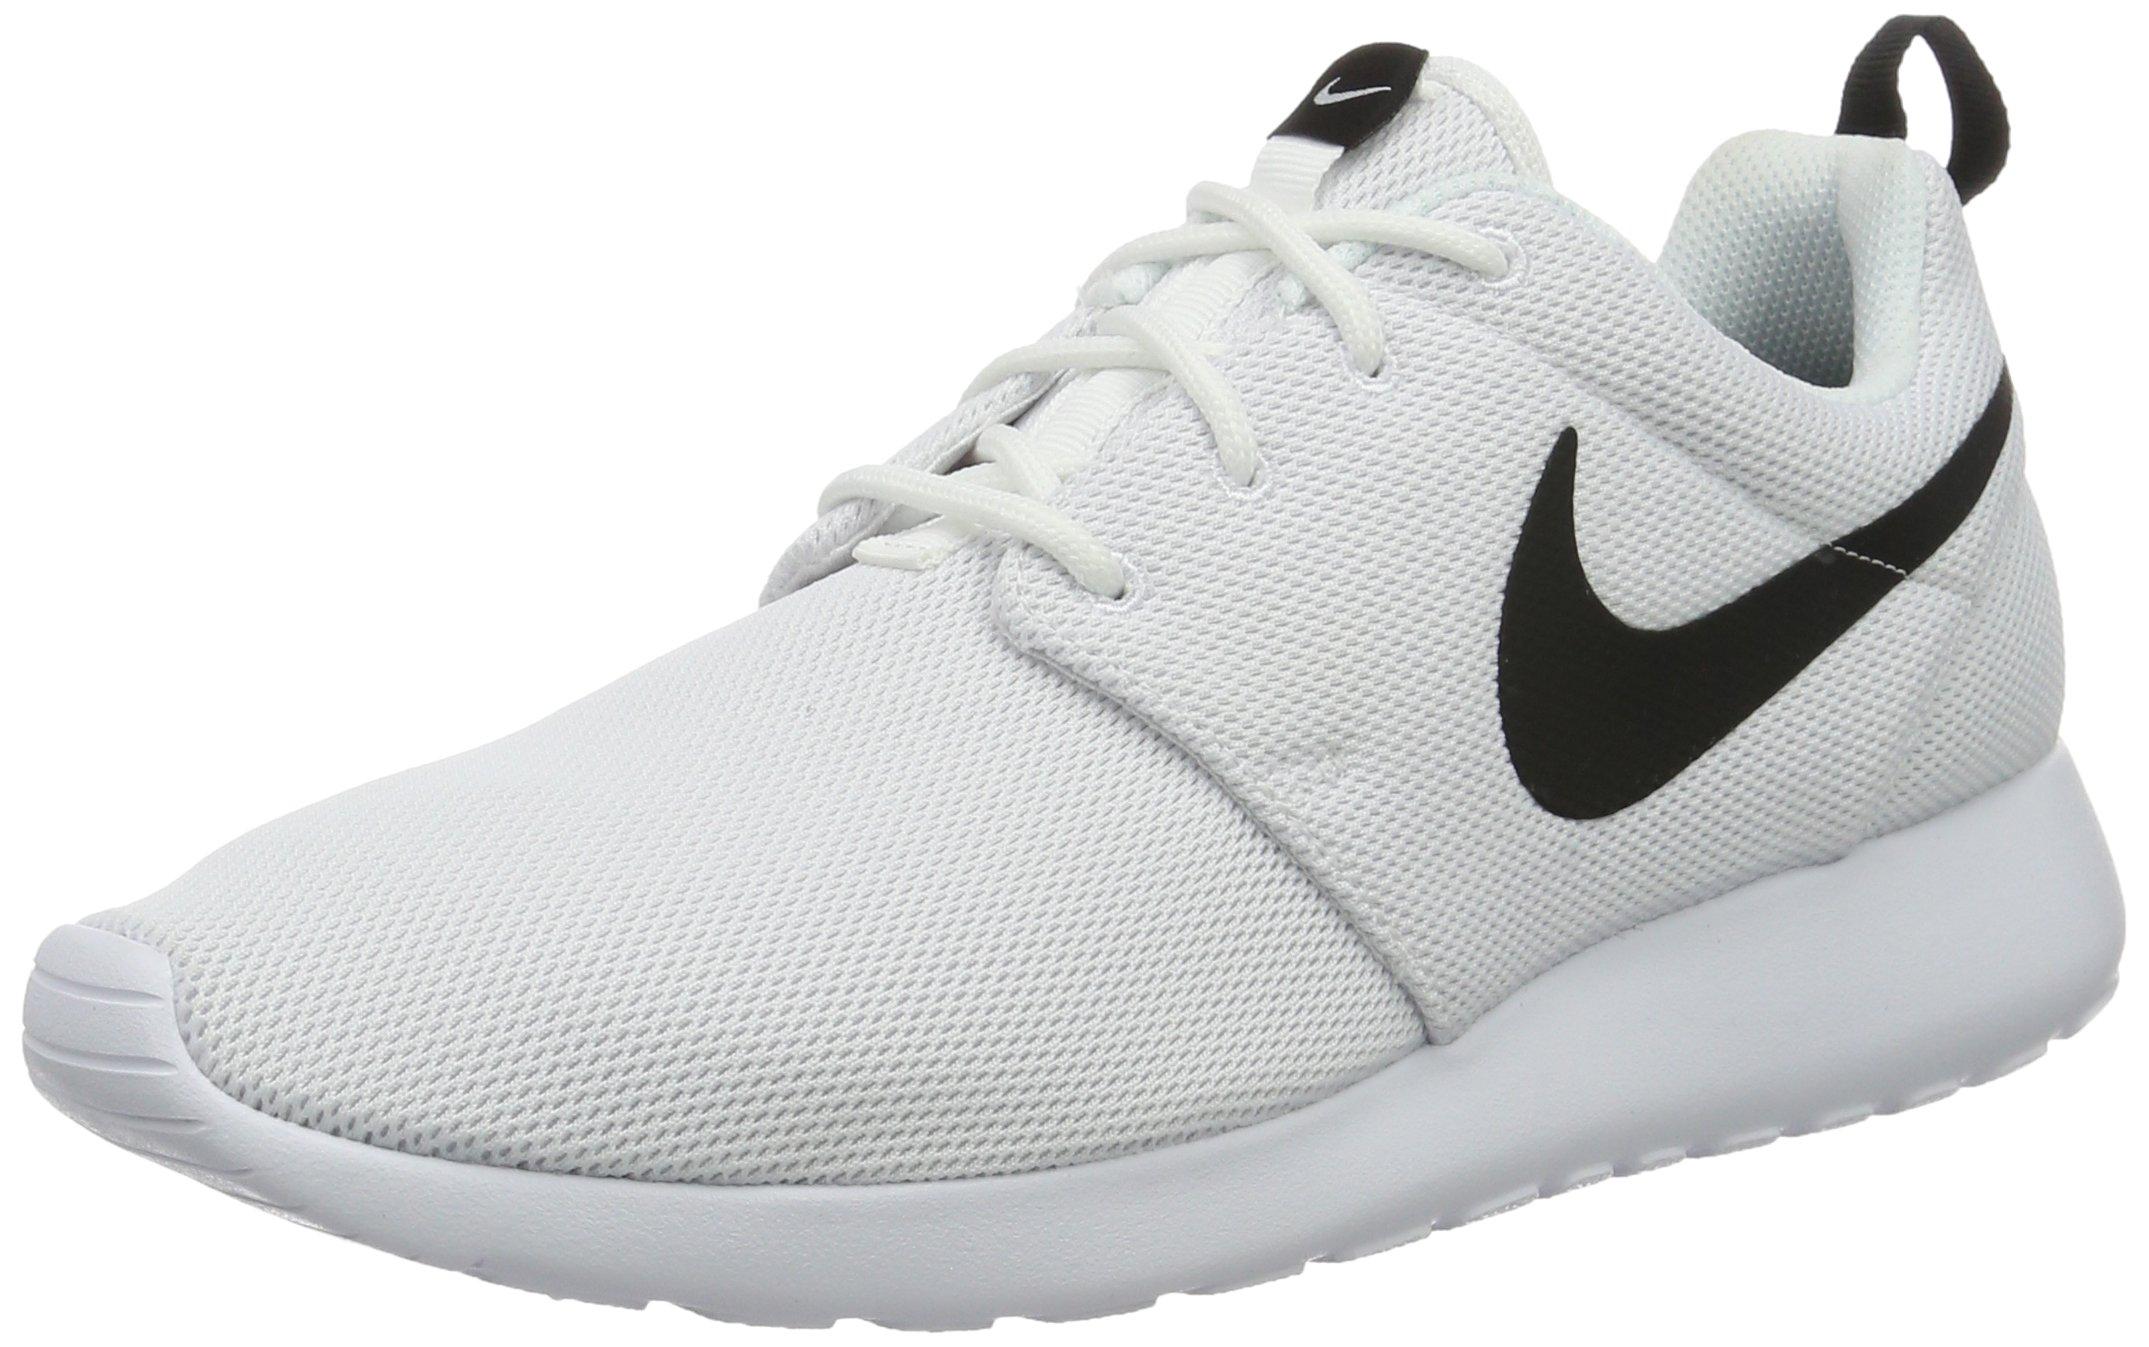 Roshe OneChaussures Running White FemmesBlanc De Nike Black44 Eu Entrainement XkiPuZ